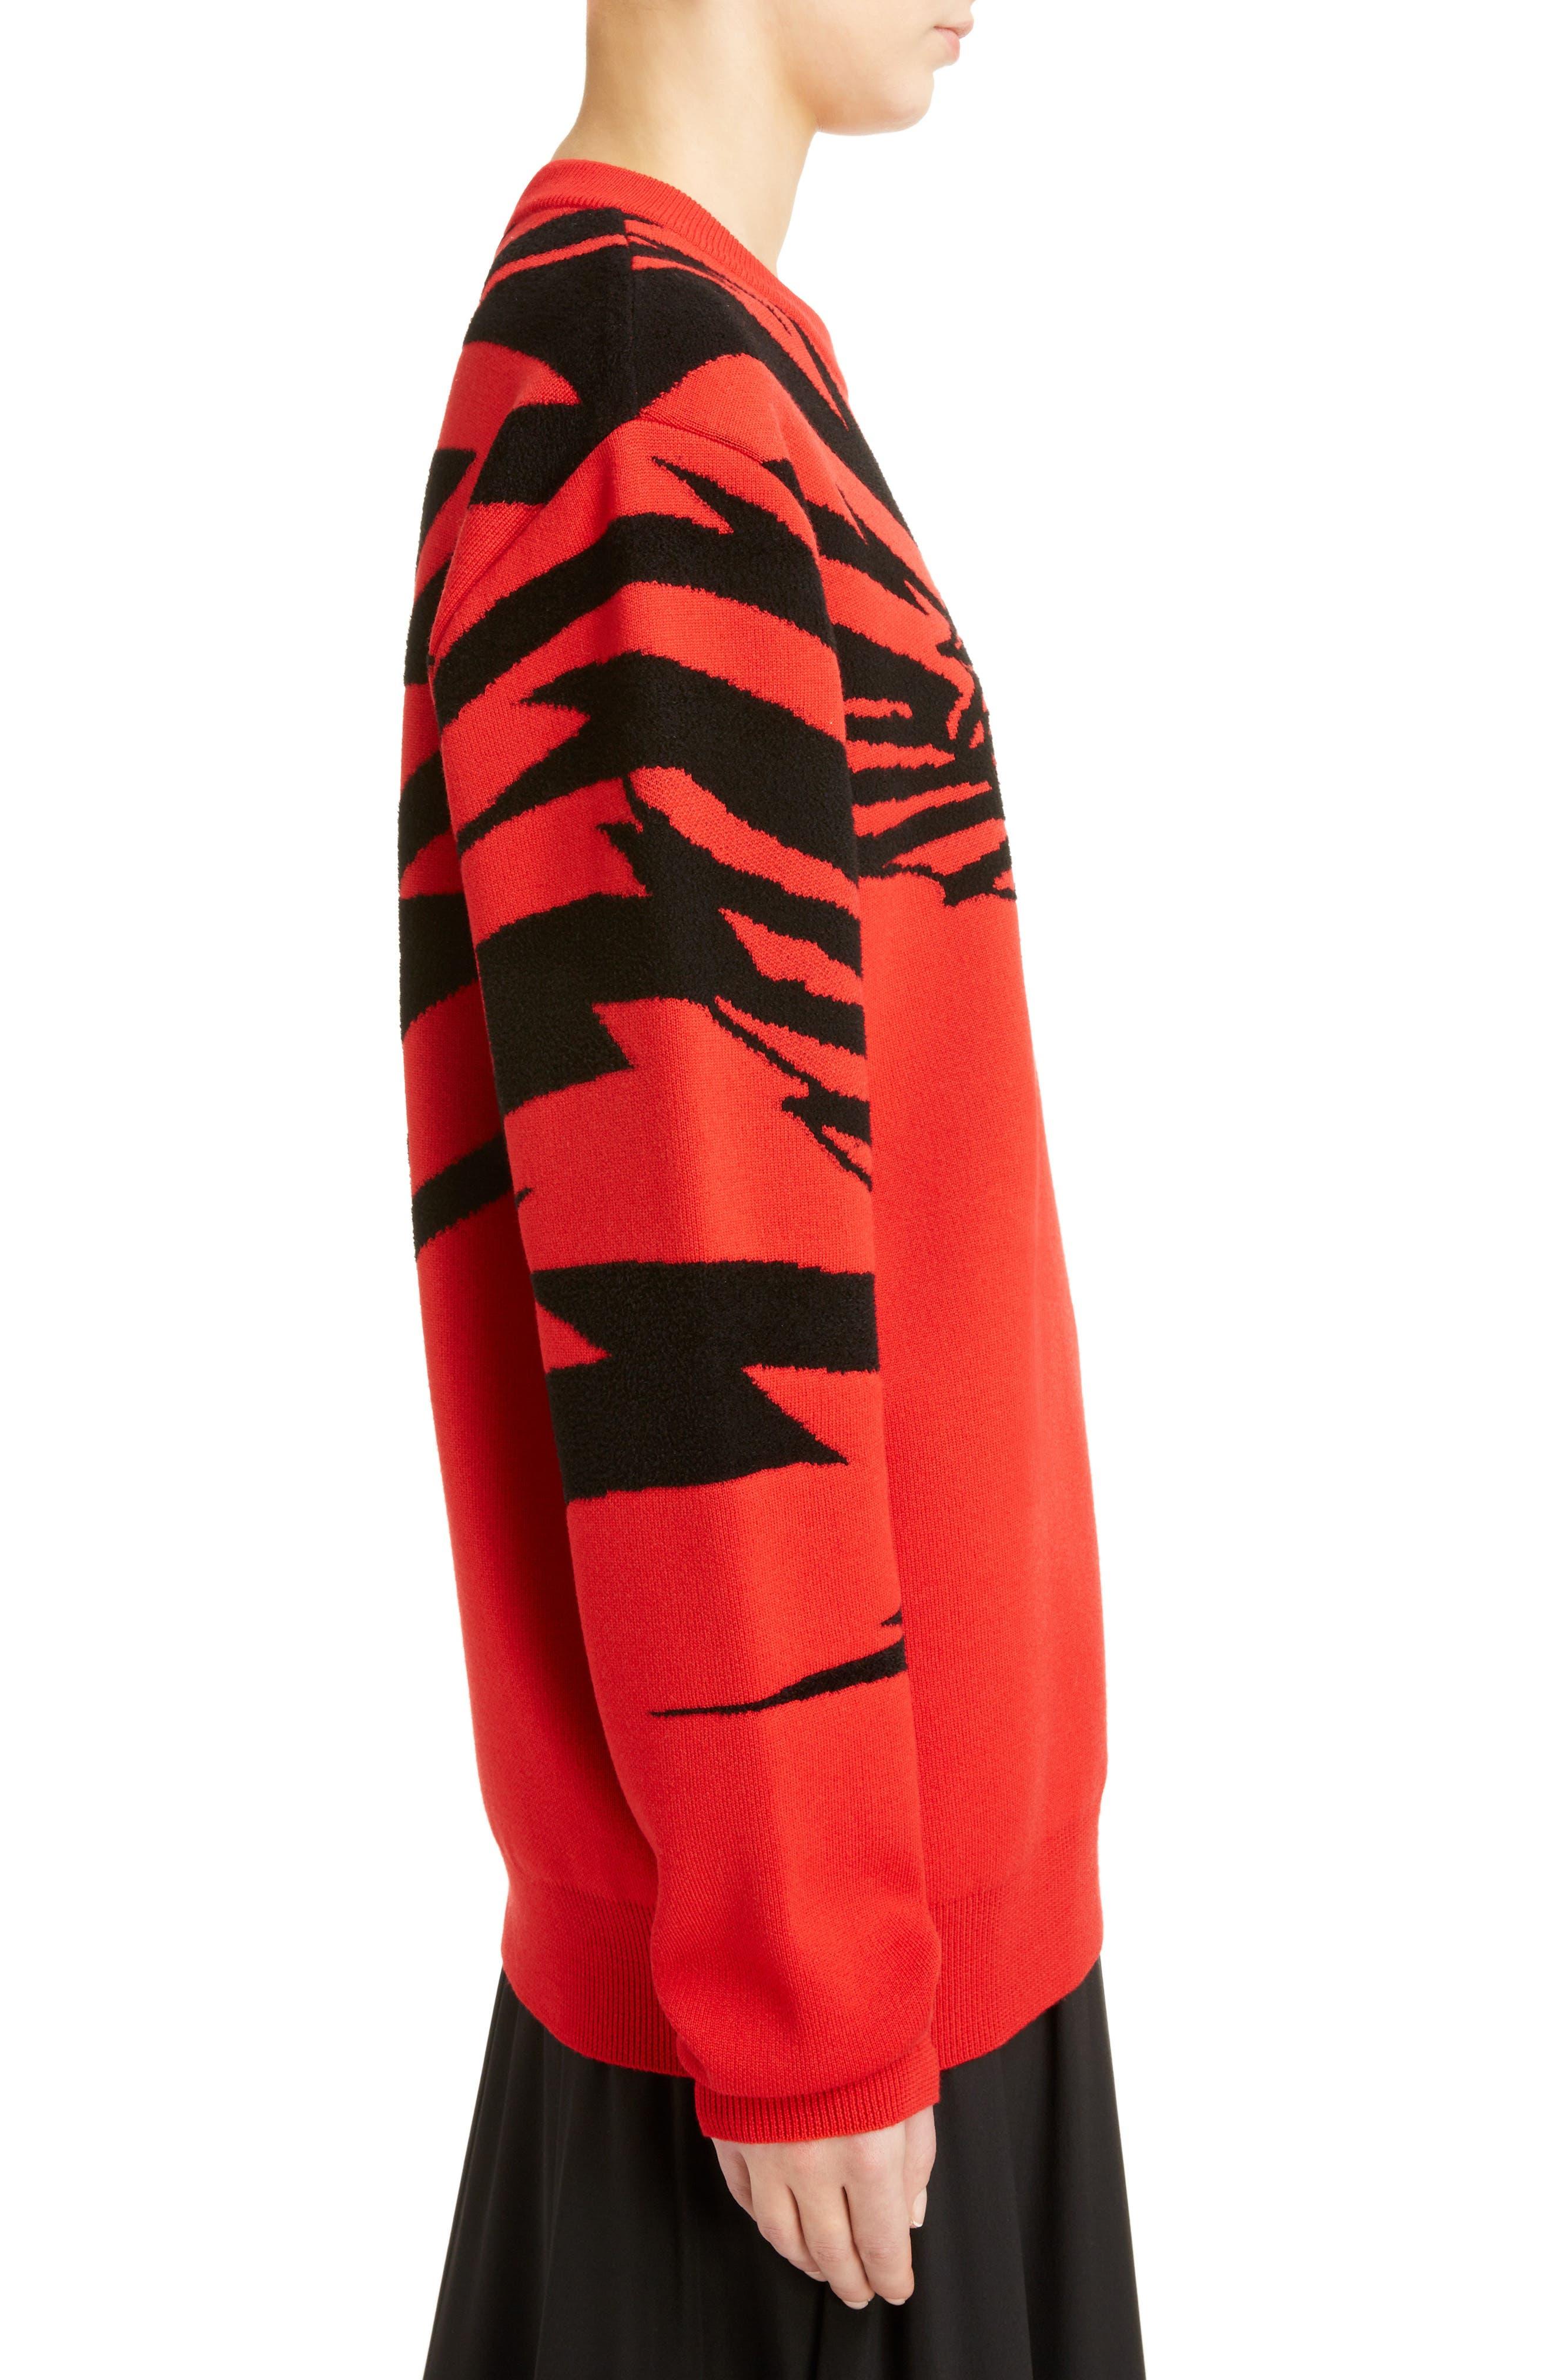 Tiger Wool Jacquard Sweater,                             Alternate thumbnail 3, color,                             RED/ BLACK